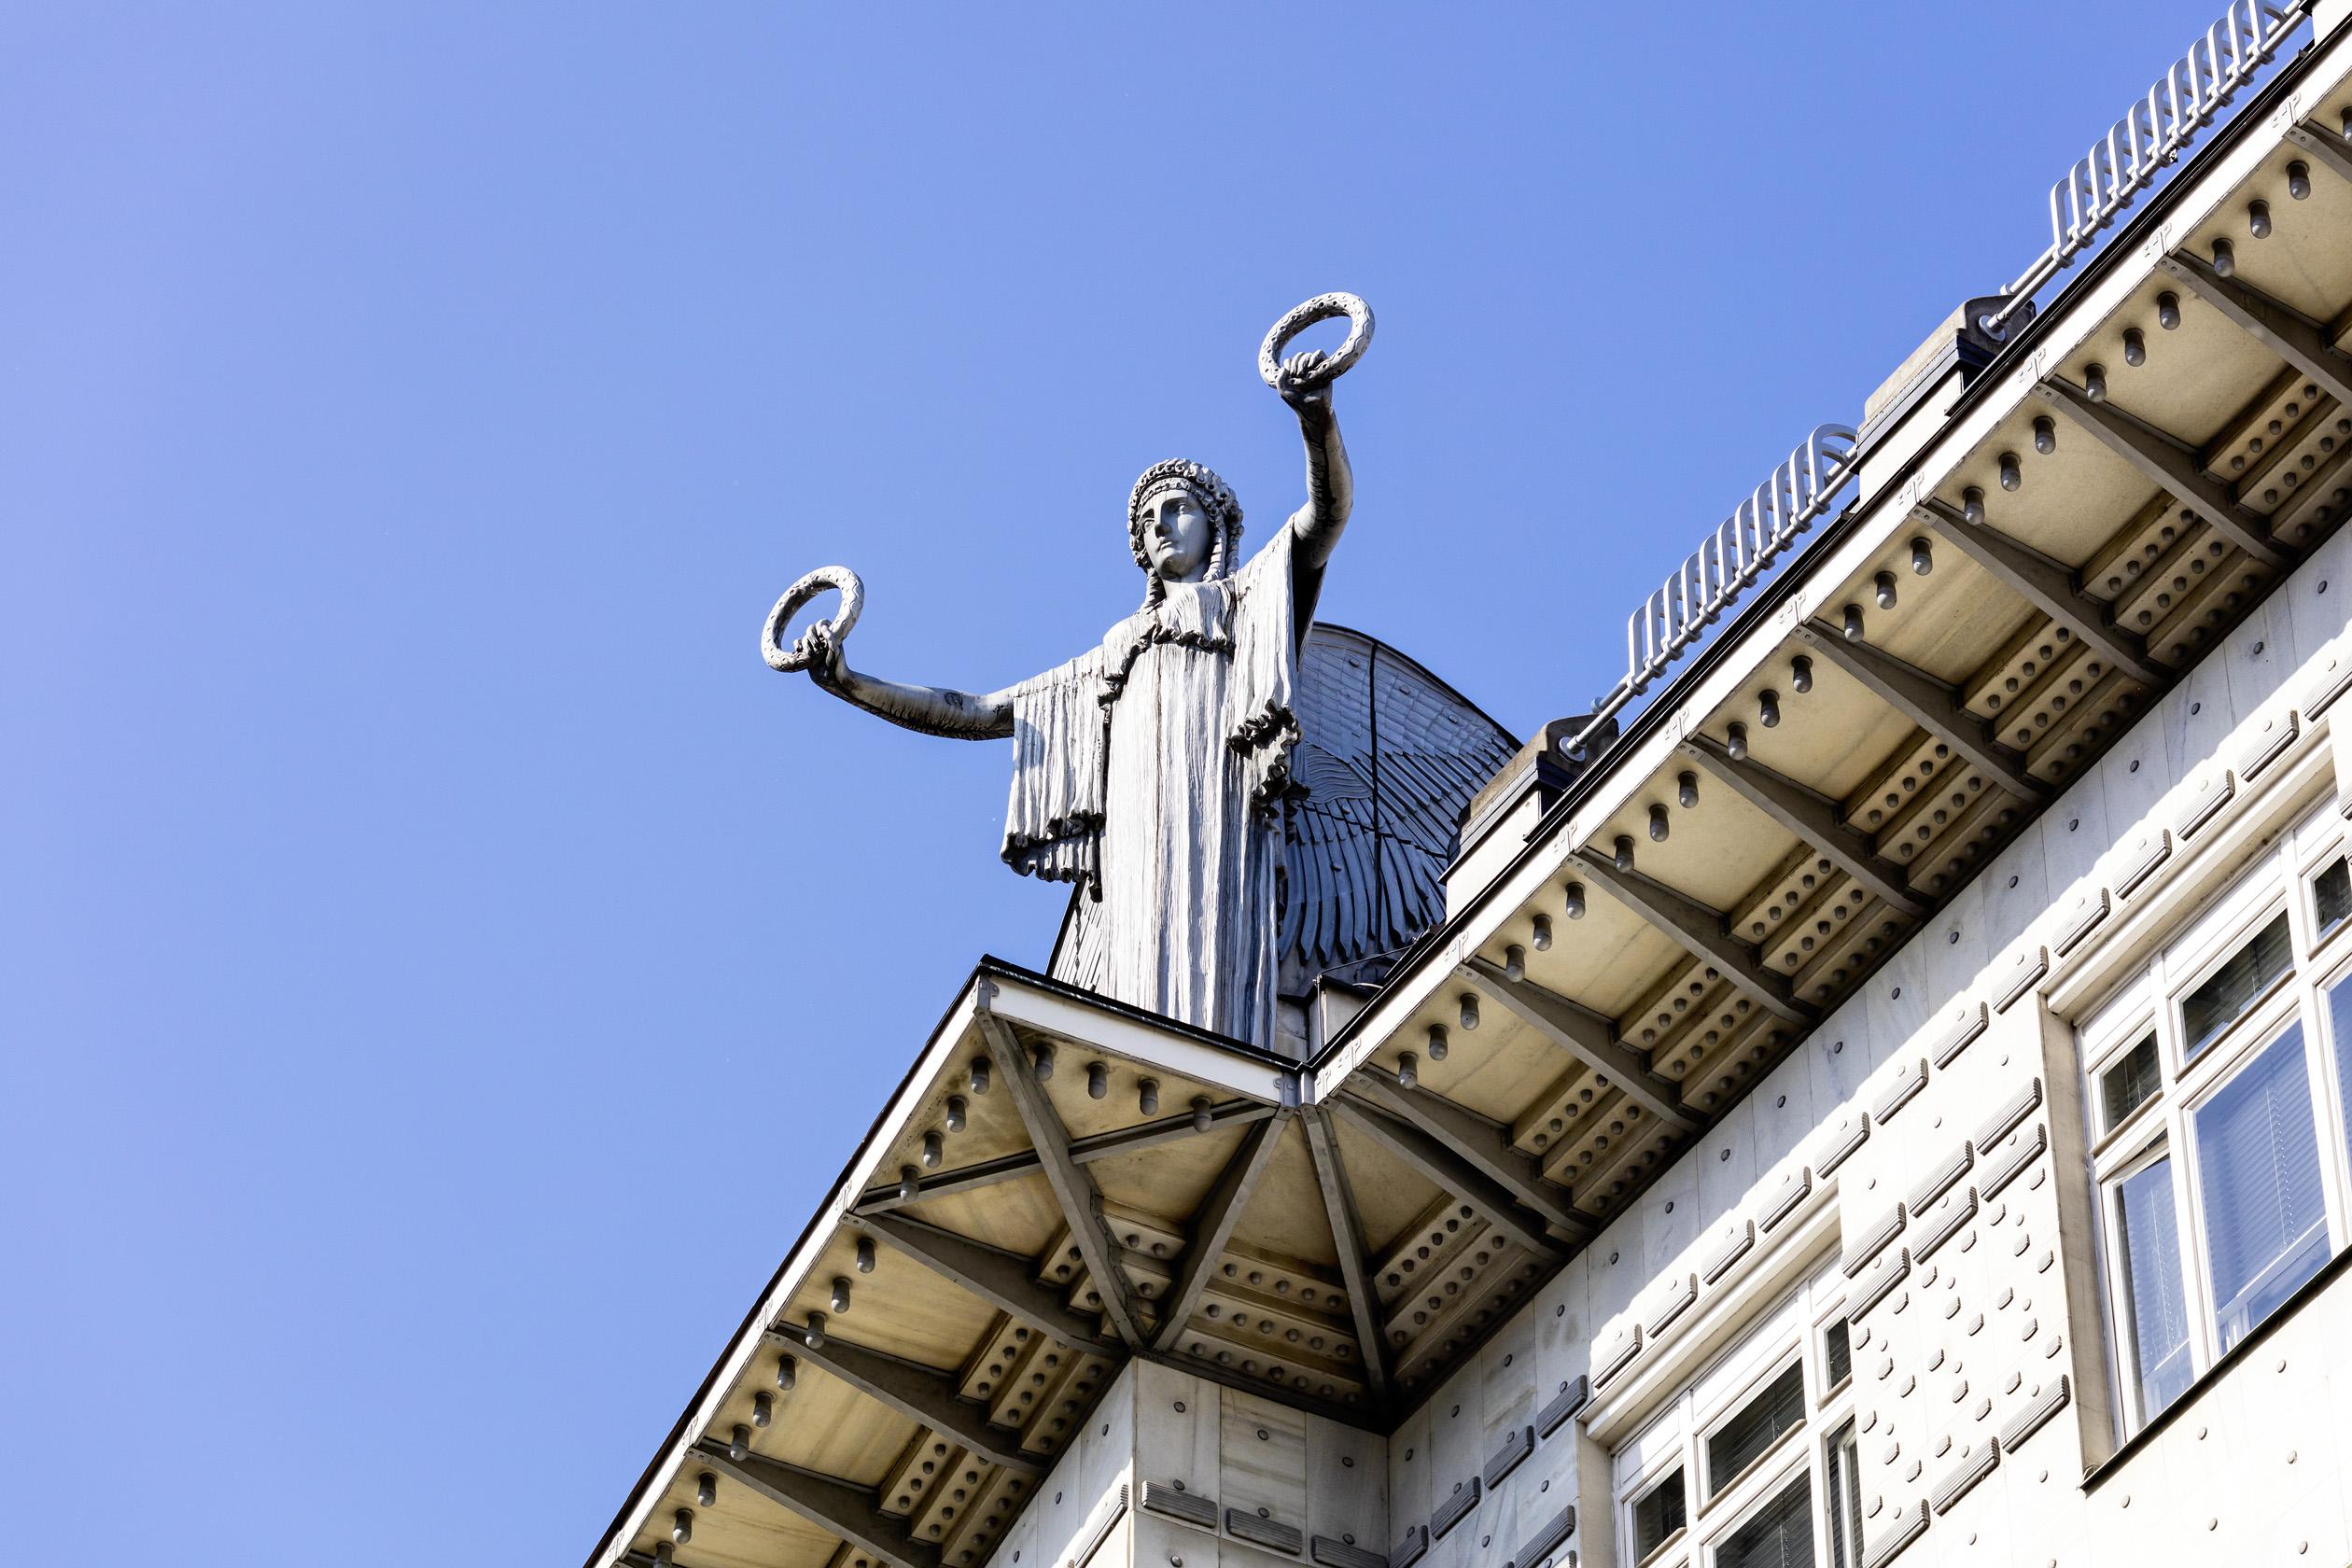 3Wien Tourismus-Christian Stemper